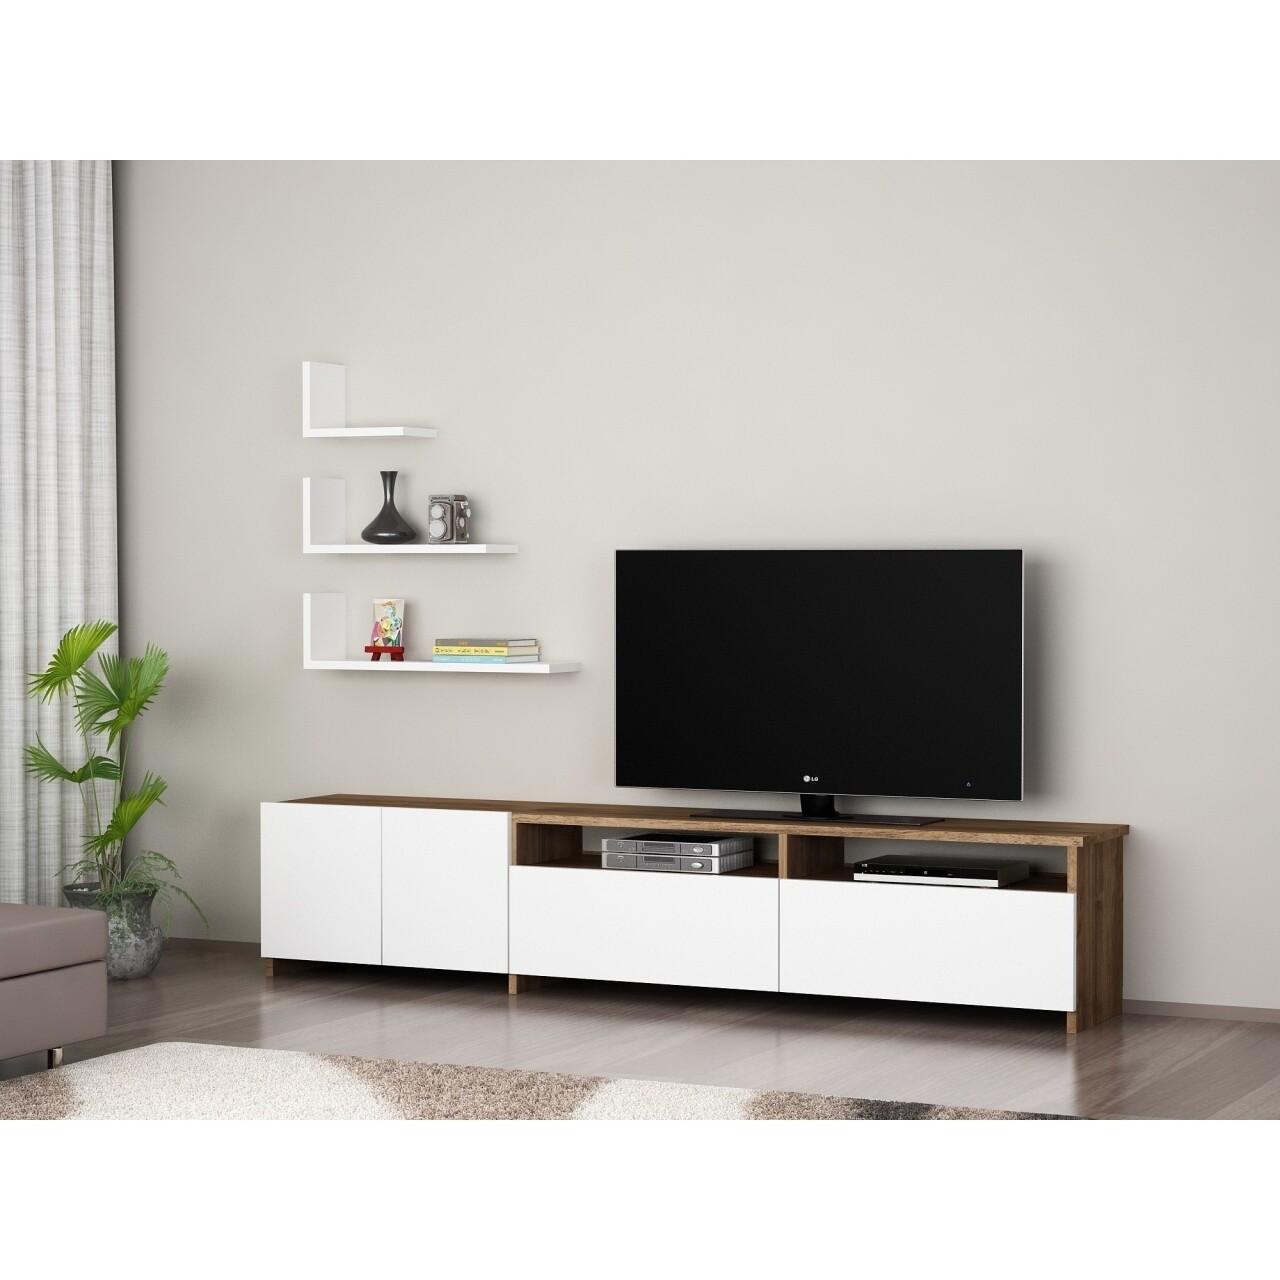 Comoda TV cu rafturi, Wooden Art, Gelincik White Walnut, 180x103.1x31.6 cm